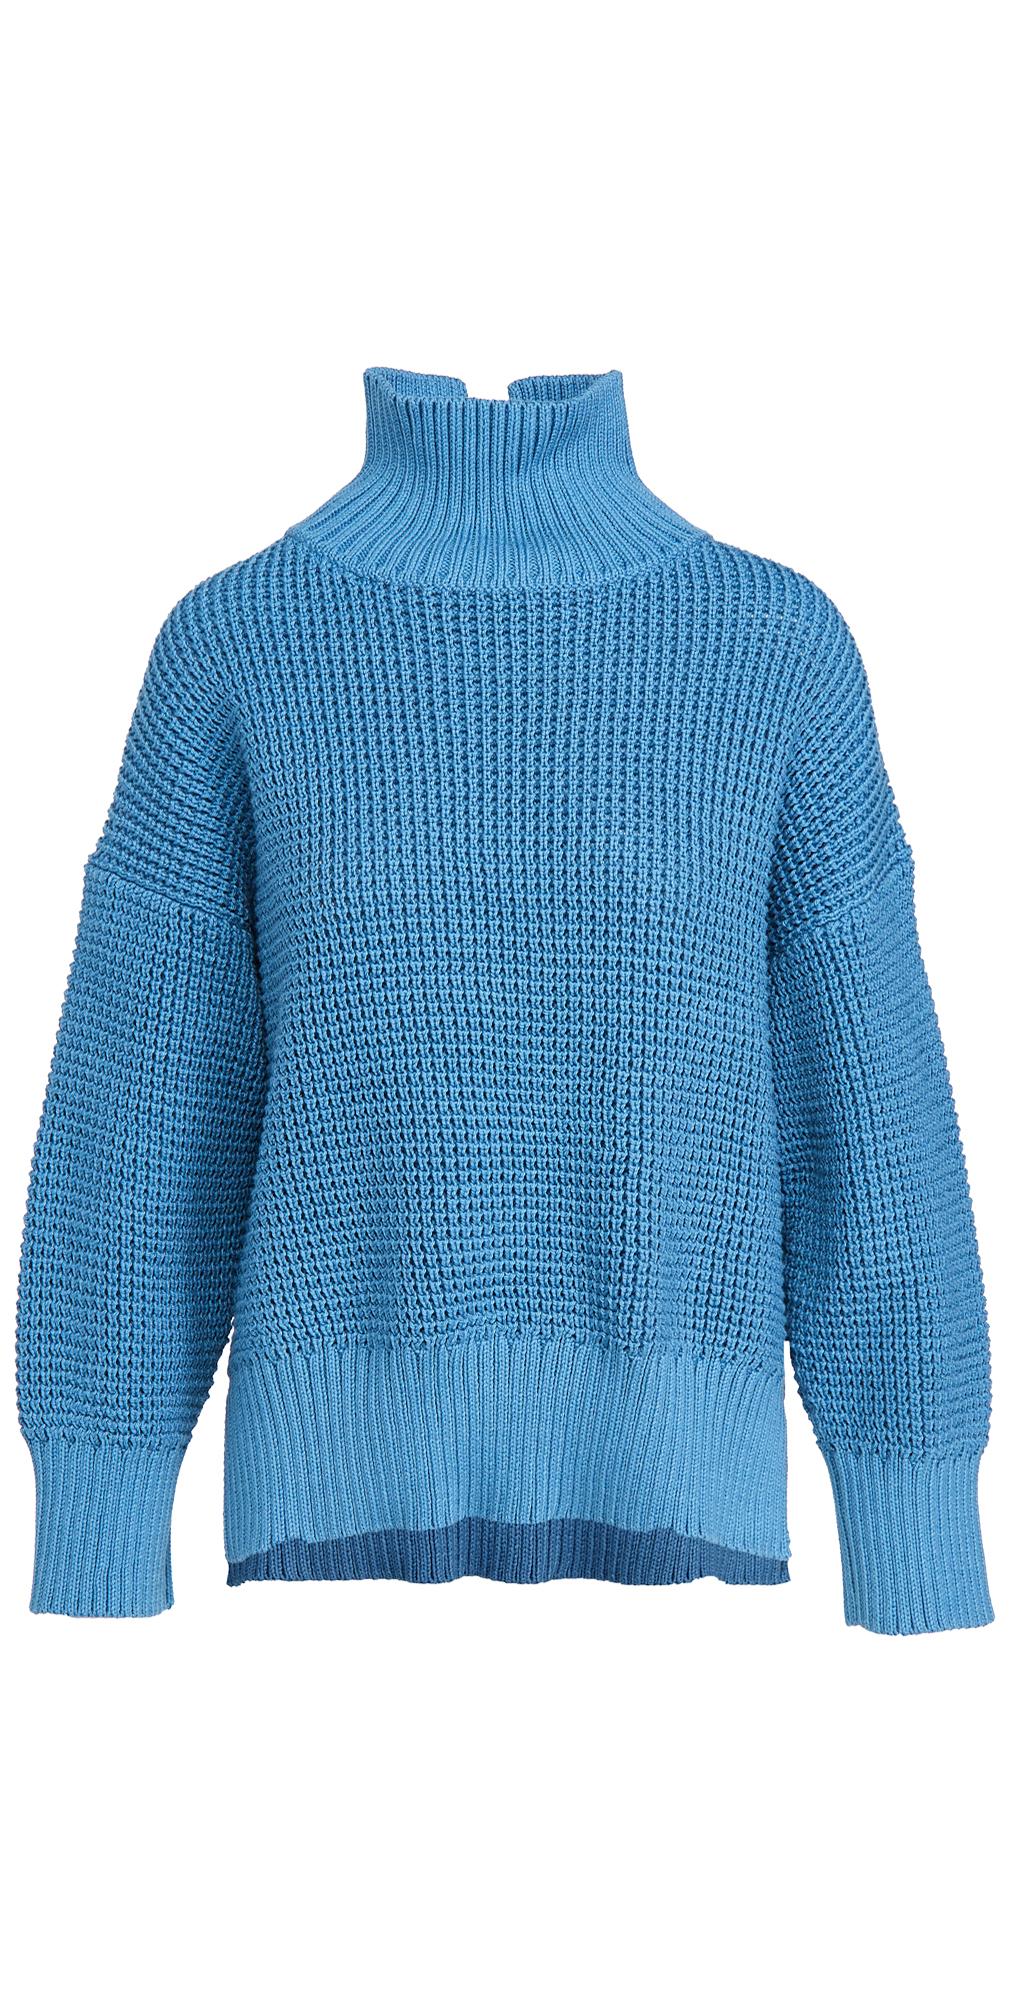 Rachel Comey Manifold Pullover